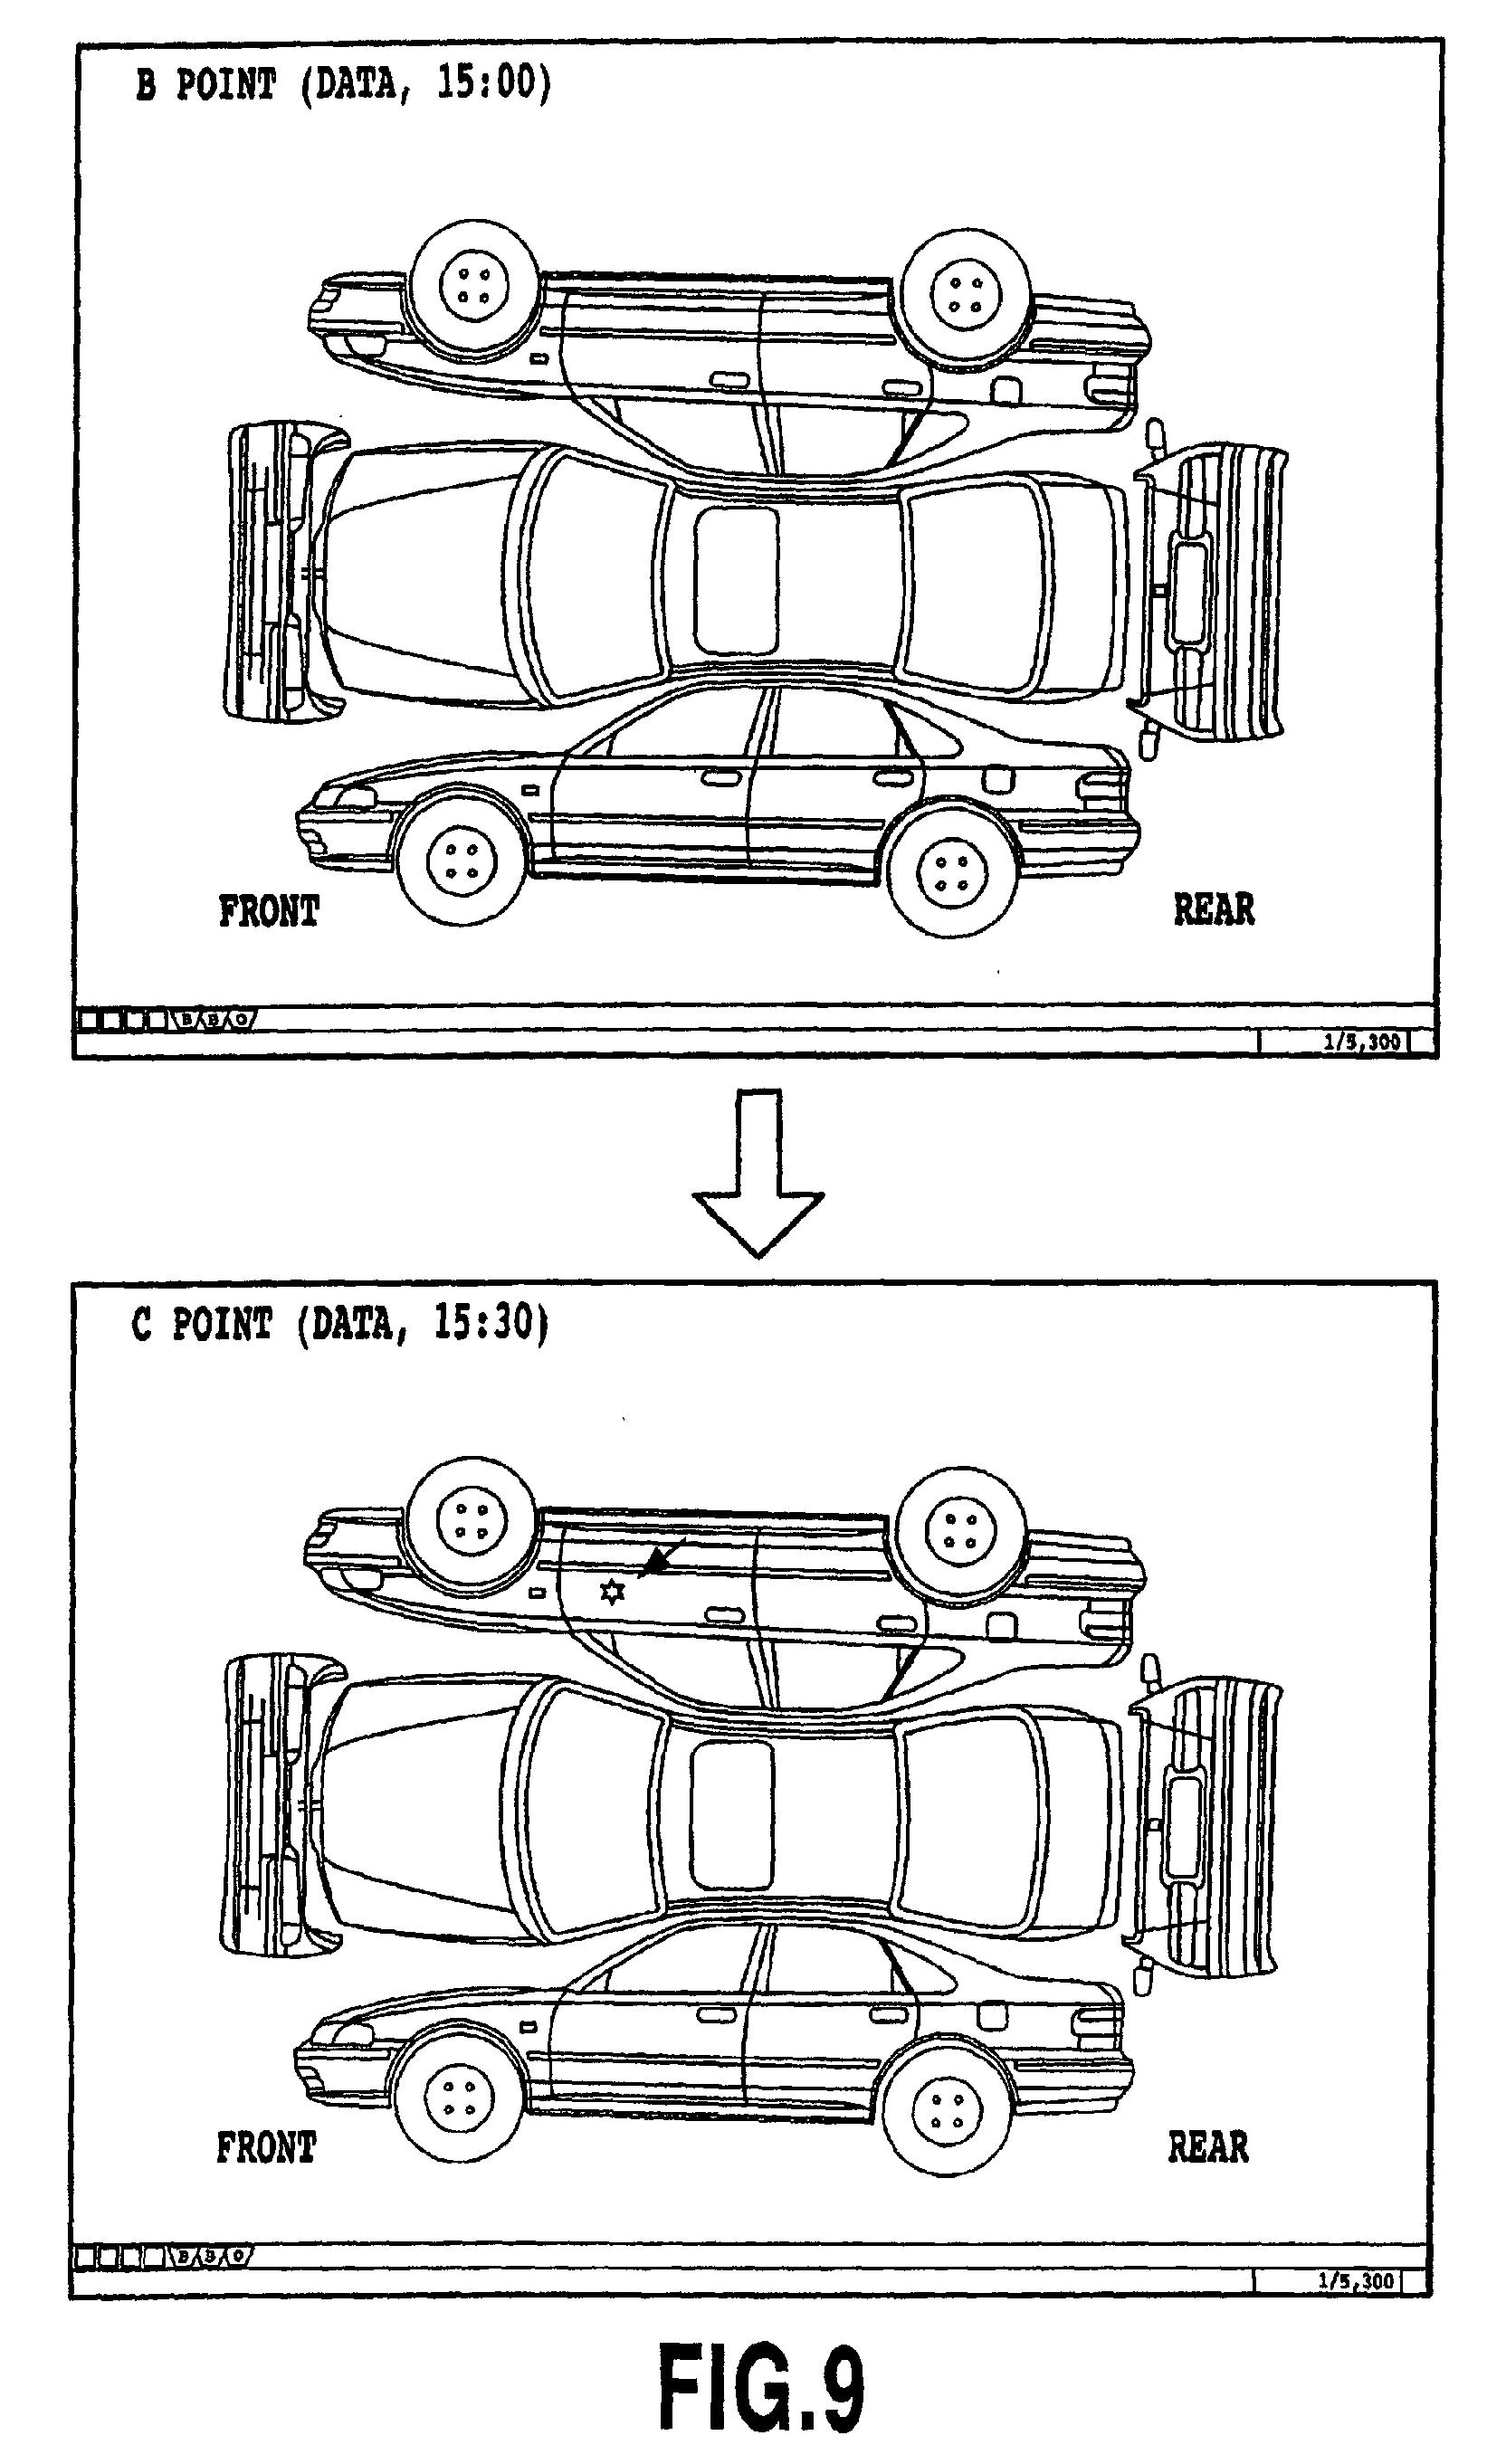 car damage check best cars modified dur a flex. Black Bedroom Furniture Sets. Home Design Ideas